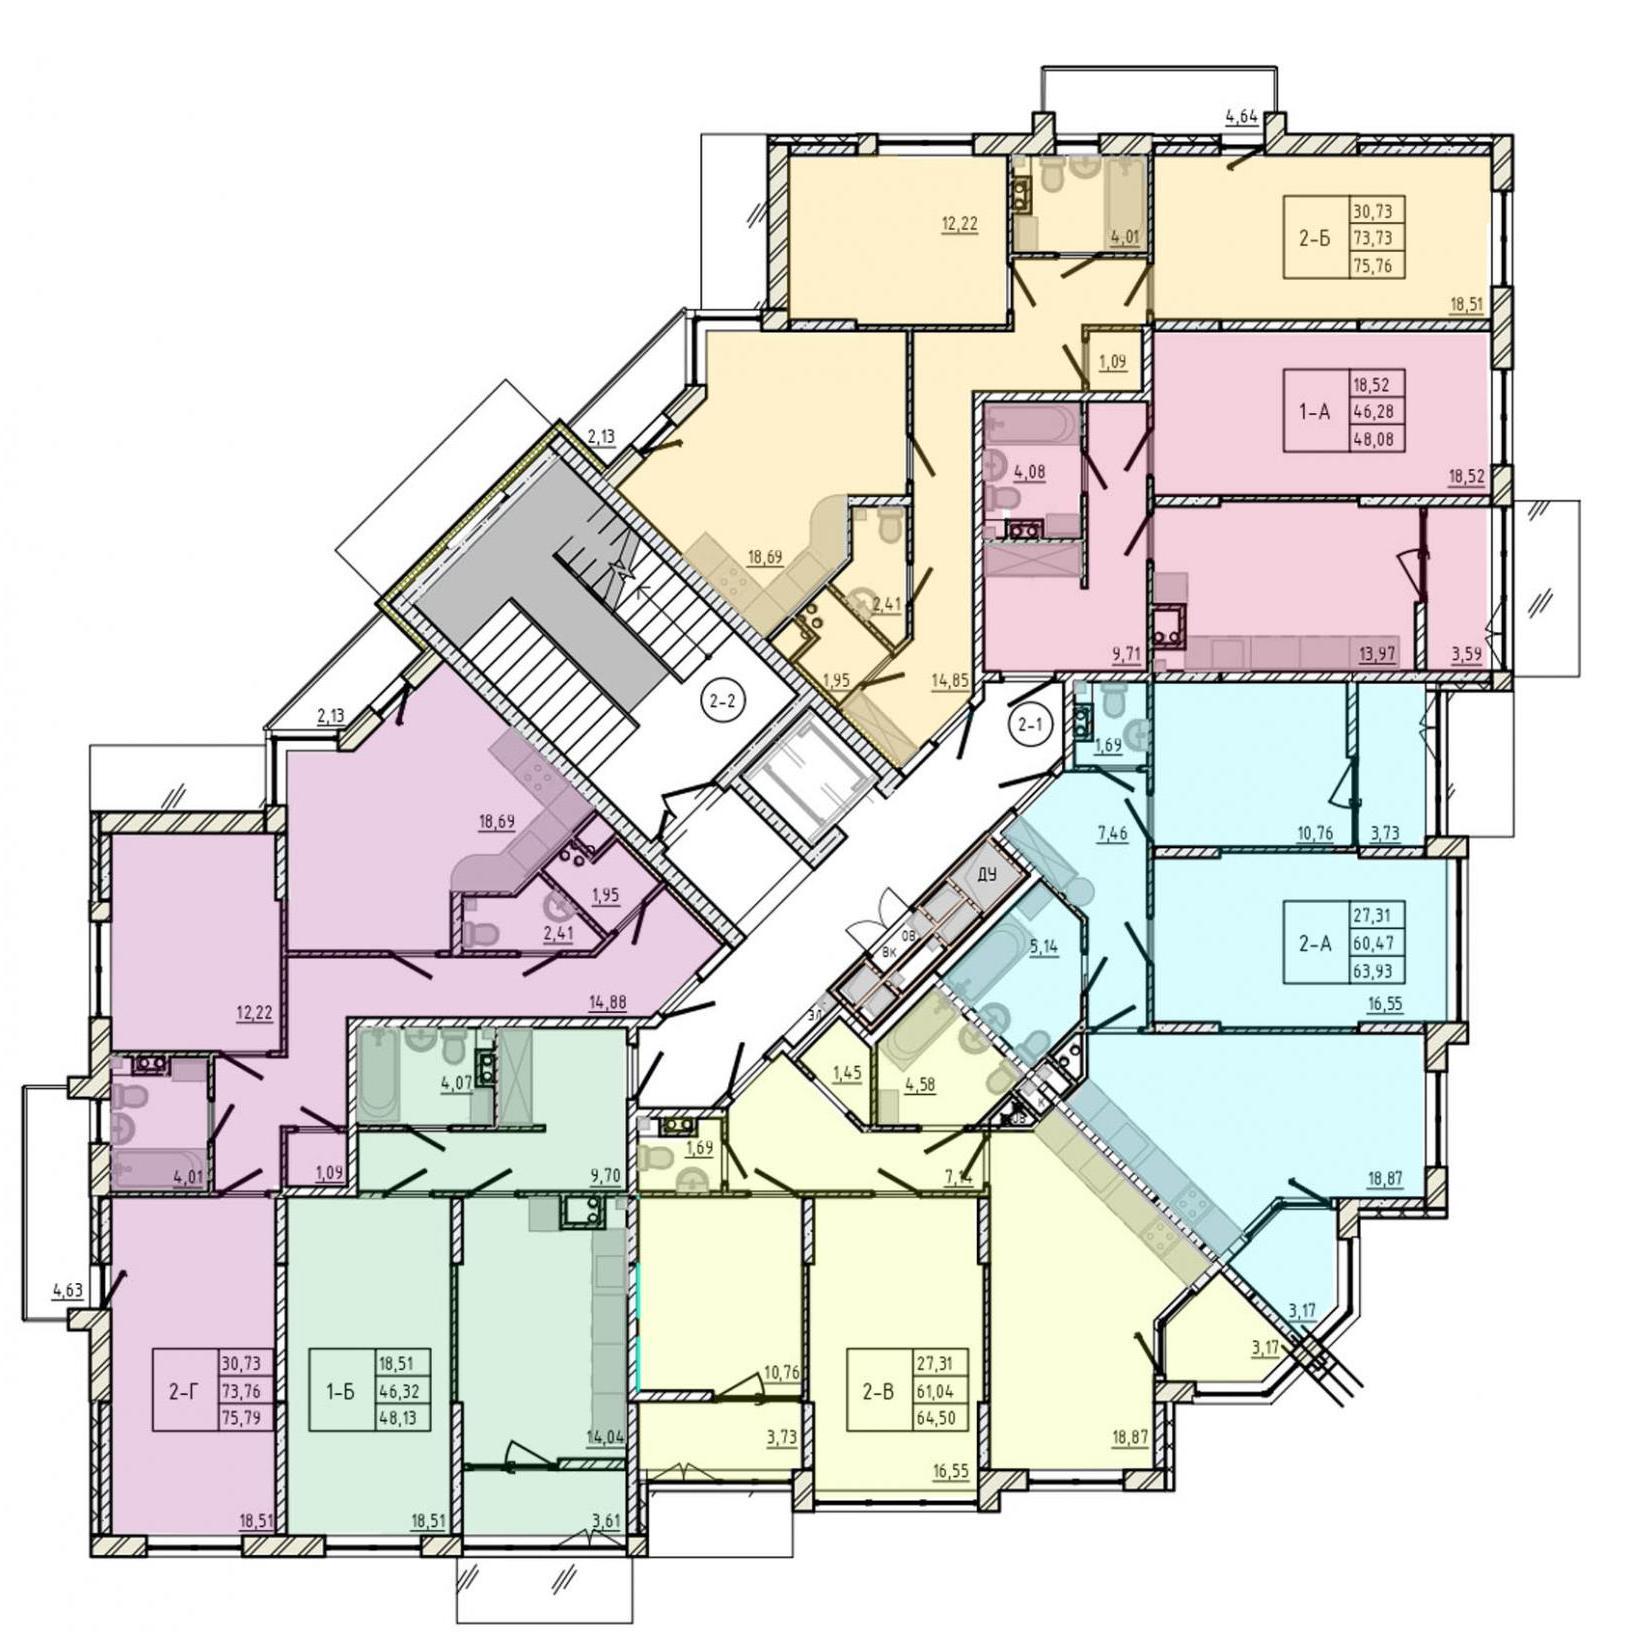 сан сити клаб хаус, клубный дом, план этажа сансити клабхаус, новострой одесса